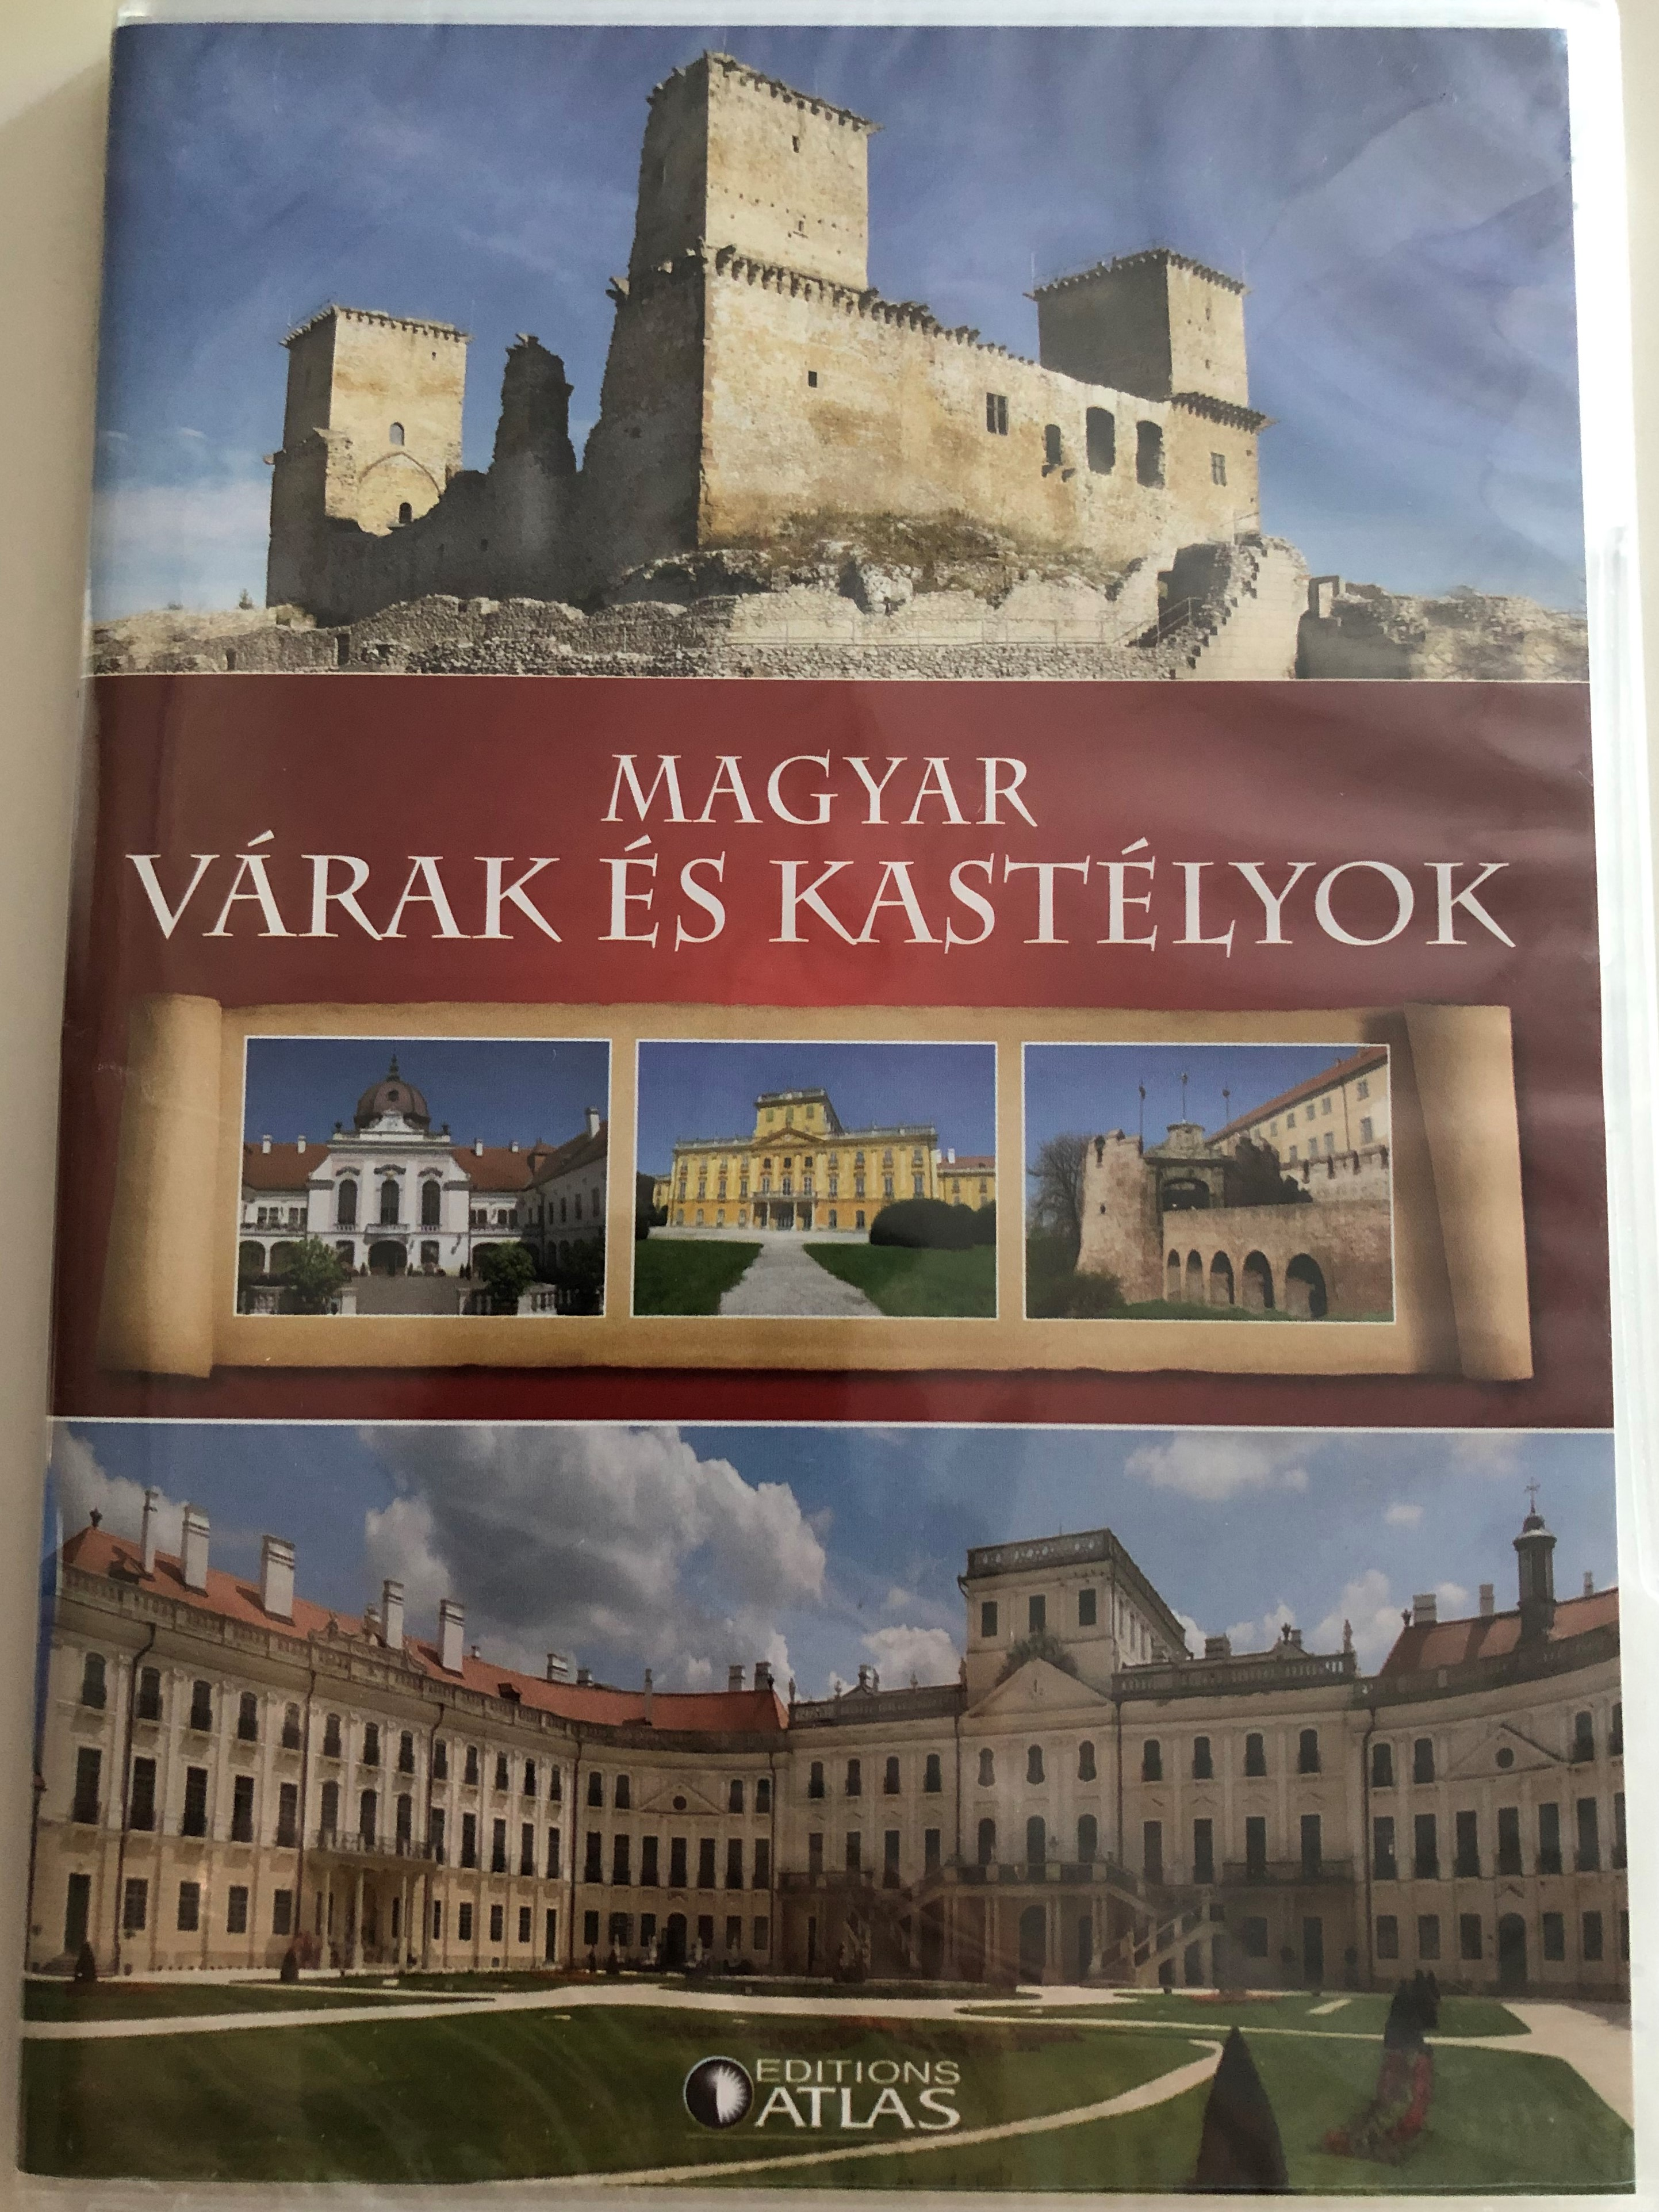 magyar-v-rak-s-kast-lyok-dvd-2012-hungarian-castles-and-fortresses-directed-by-gr-ner-j-zsef-editions-atlas-bonus-turai-castle-1-.jpg